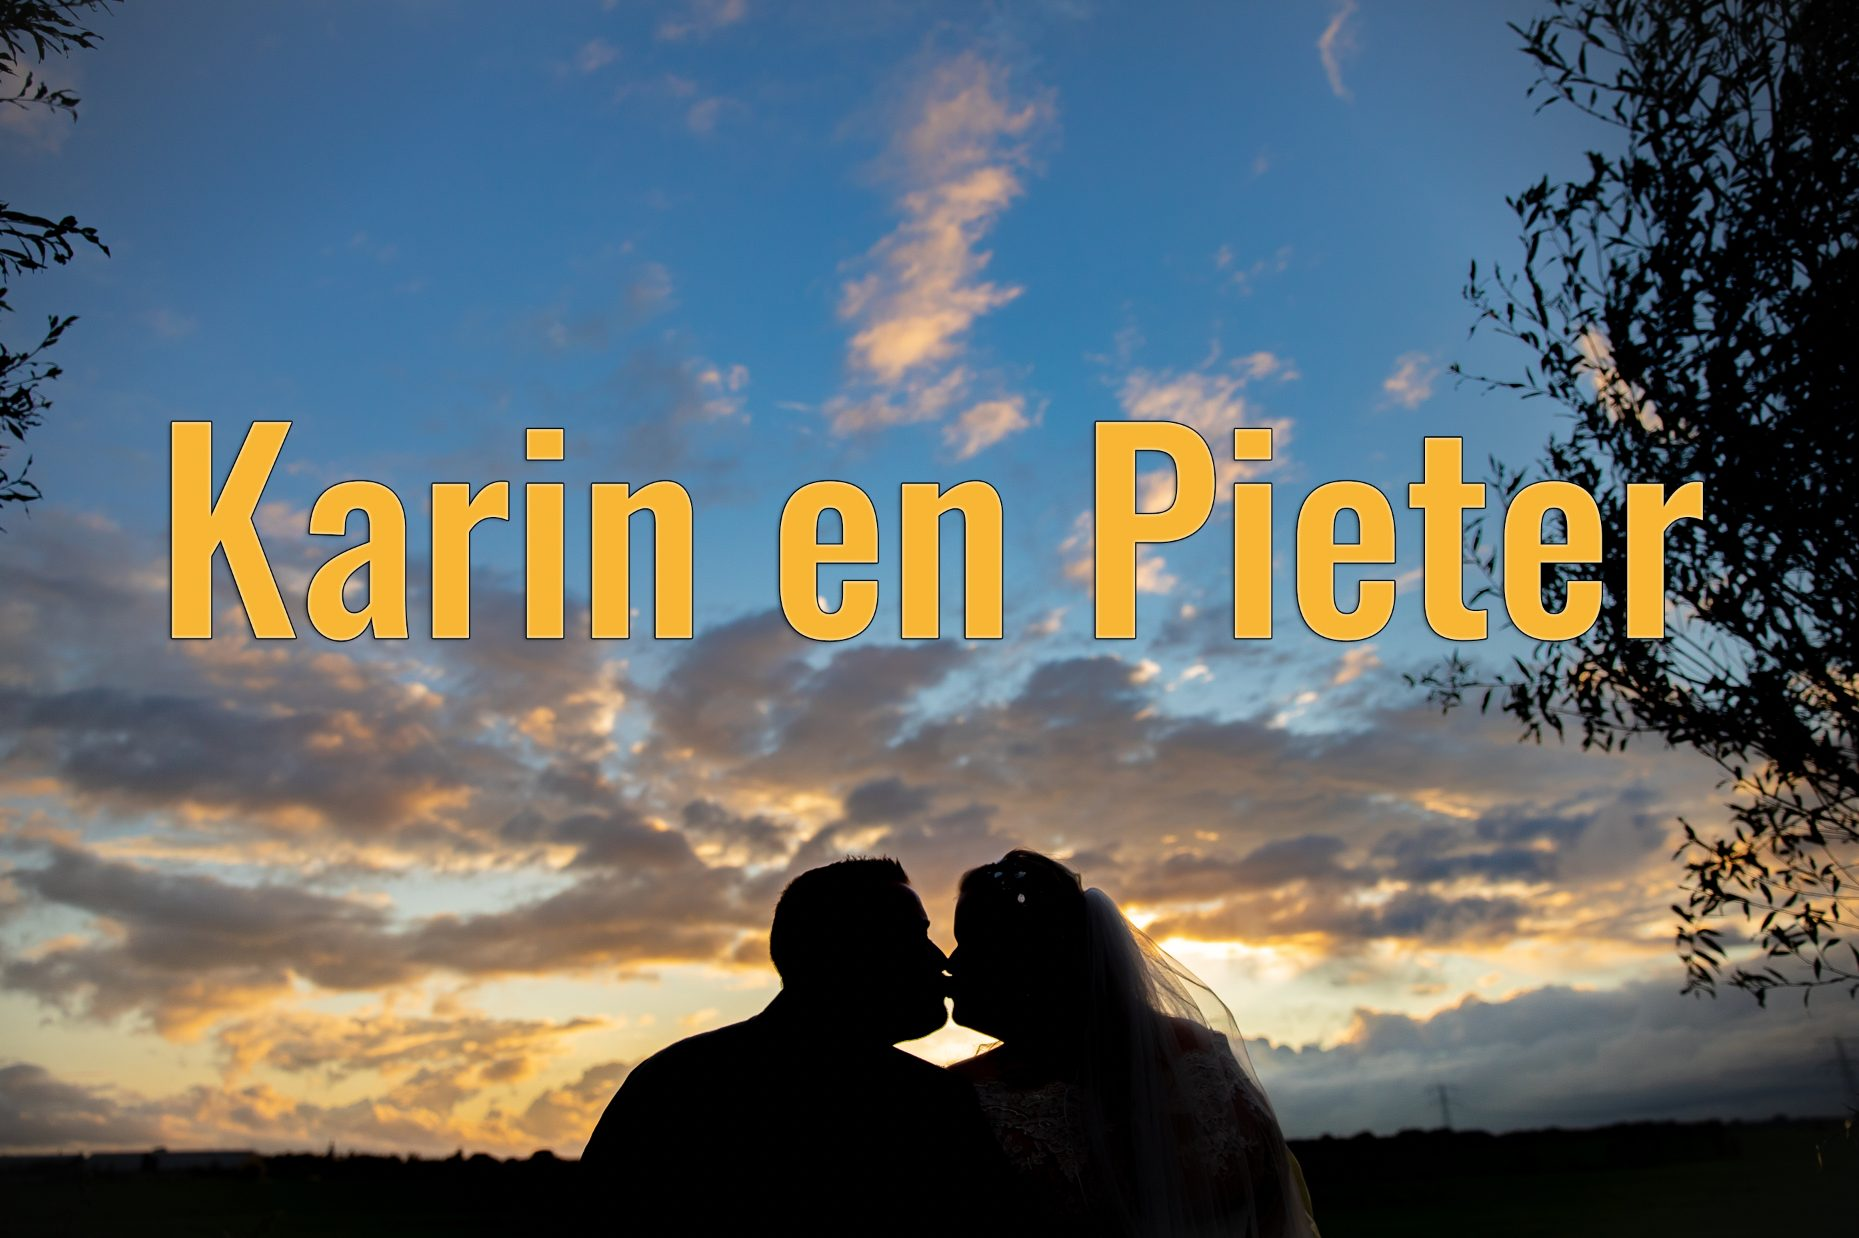 Karin en Pieter